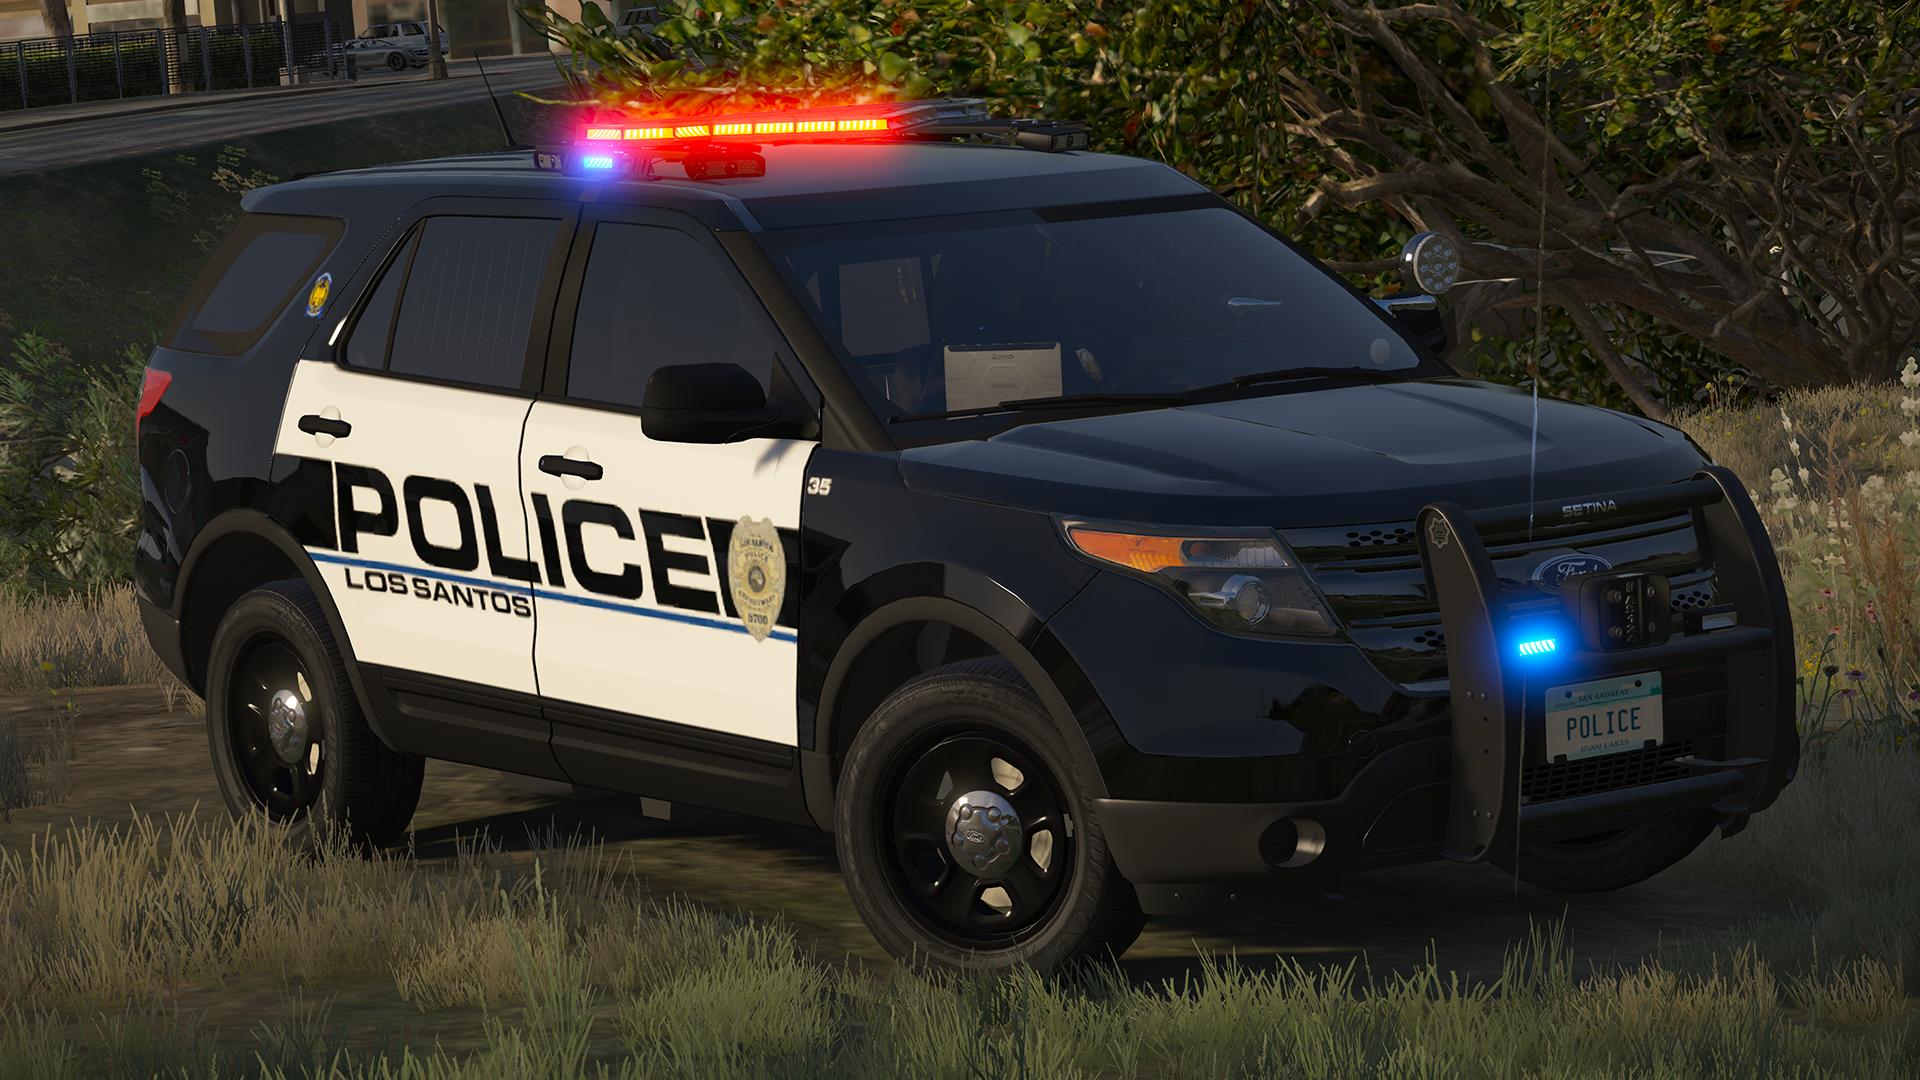 Grand_Theft_Auto_V_7_25_2020_11_48_09_PM.png.49ed03958ec33c326494a9bb228fabff.png